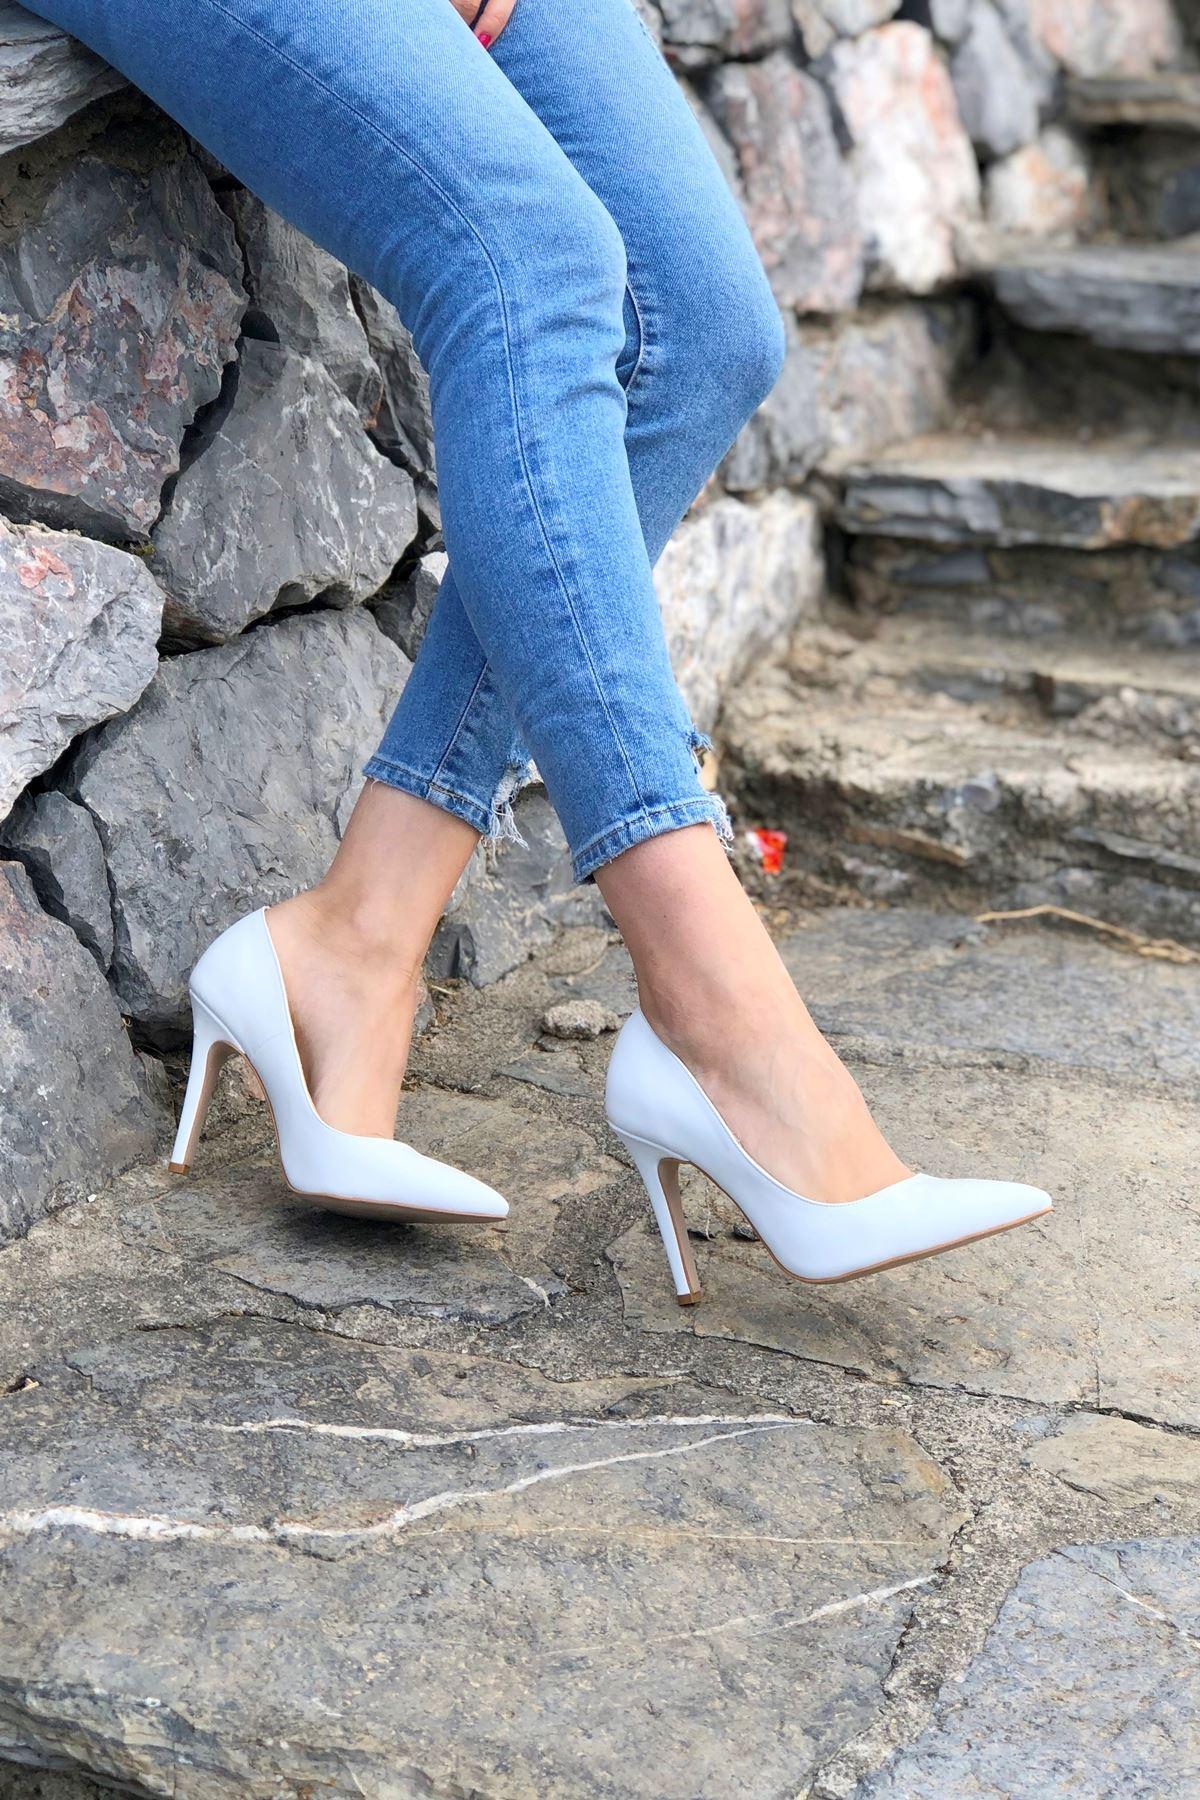 Tokyo Beyaz Cilt Topuklu Ayakkabı